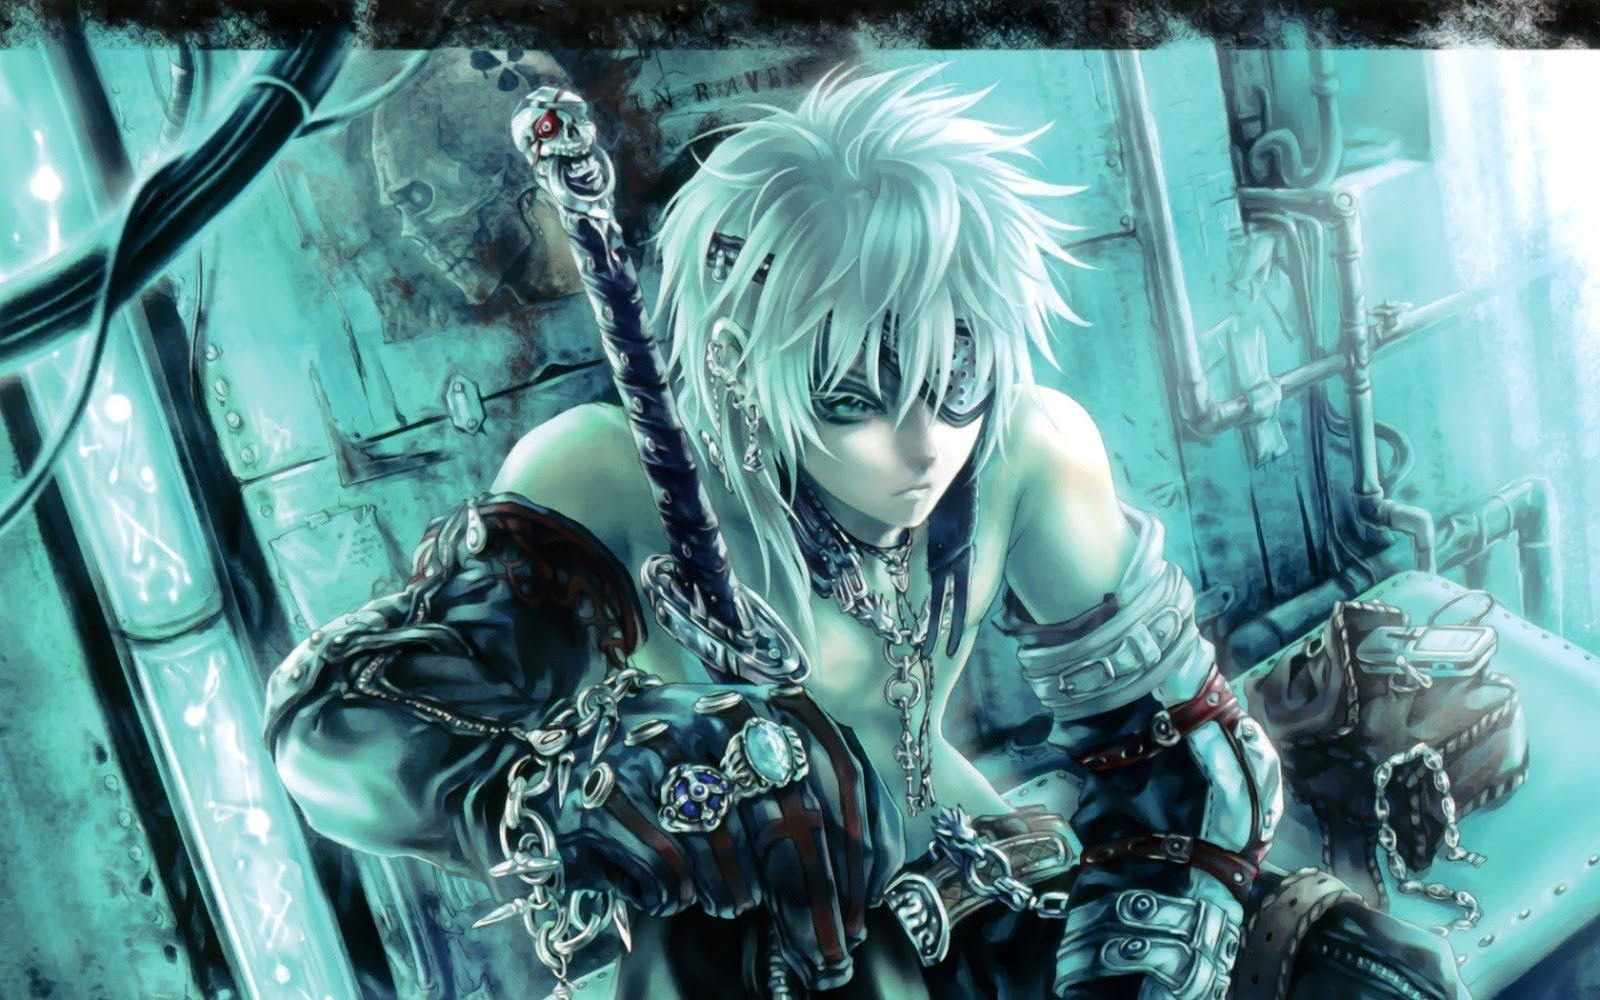 Anime Guy Fighter Sword Eye Patch 1506 HD Wallpaper 1600x1000